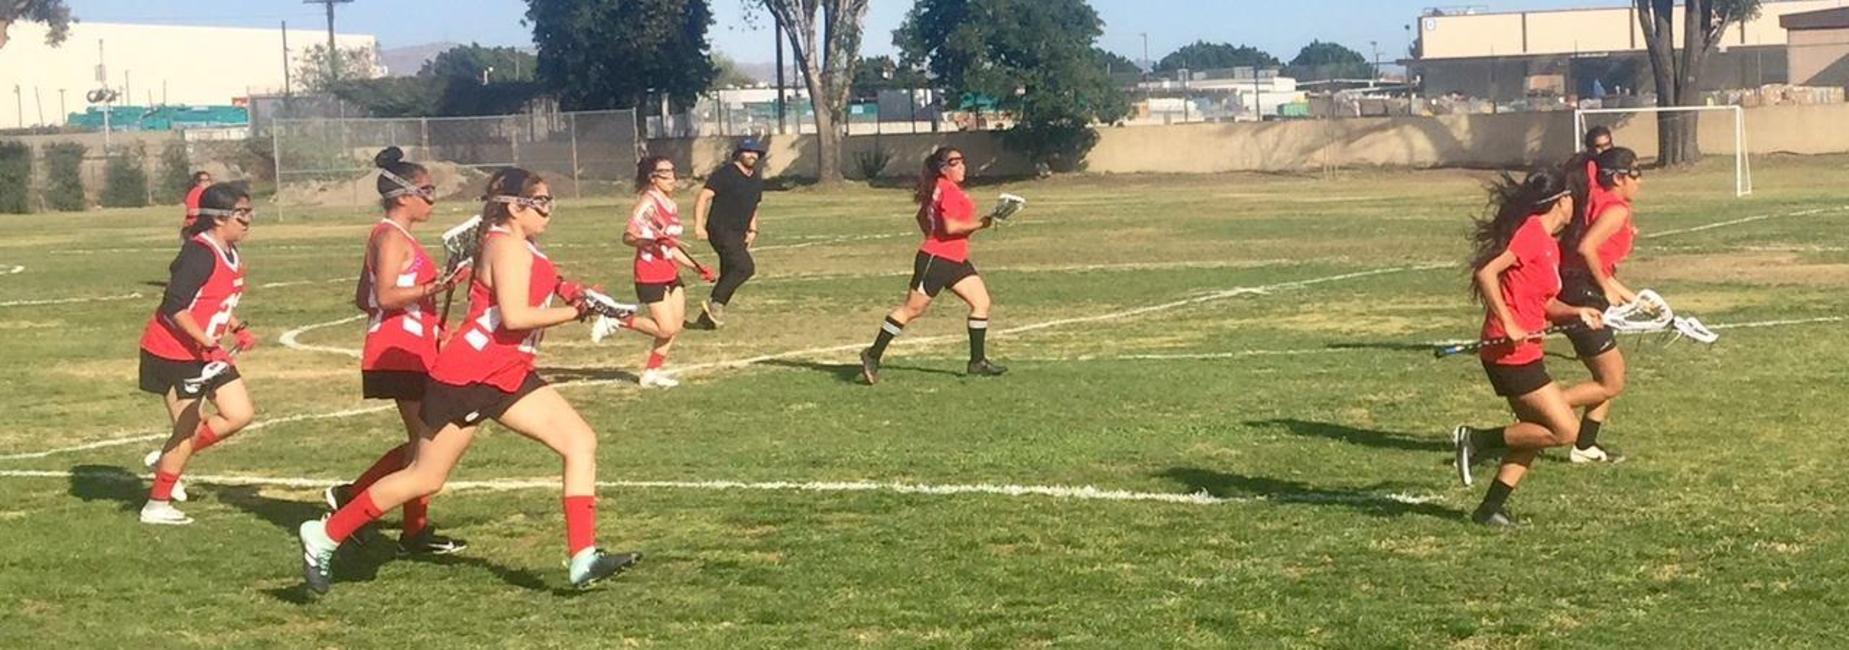 Ochoa Prep Lacrosse